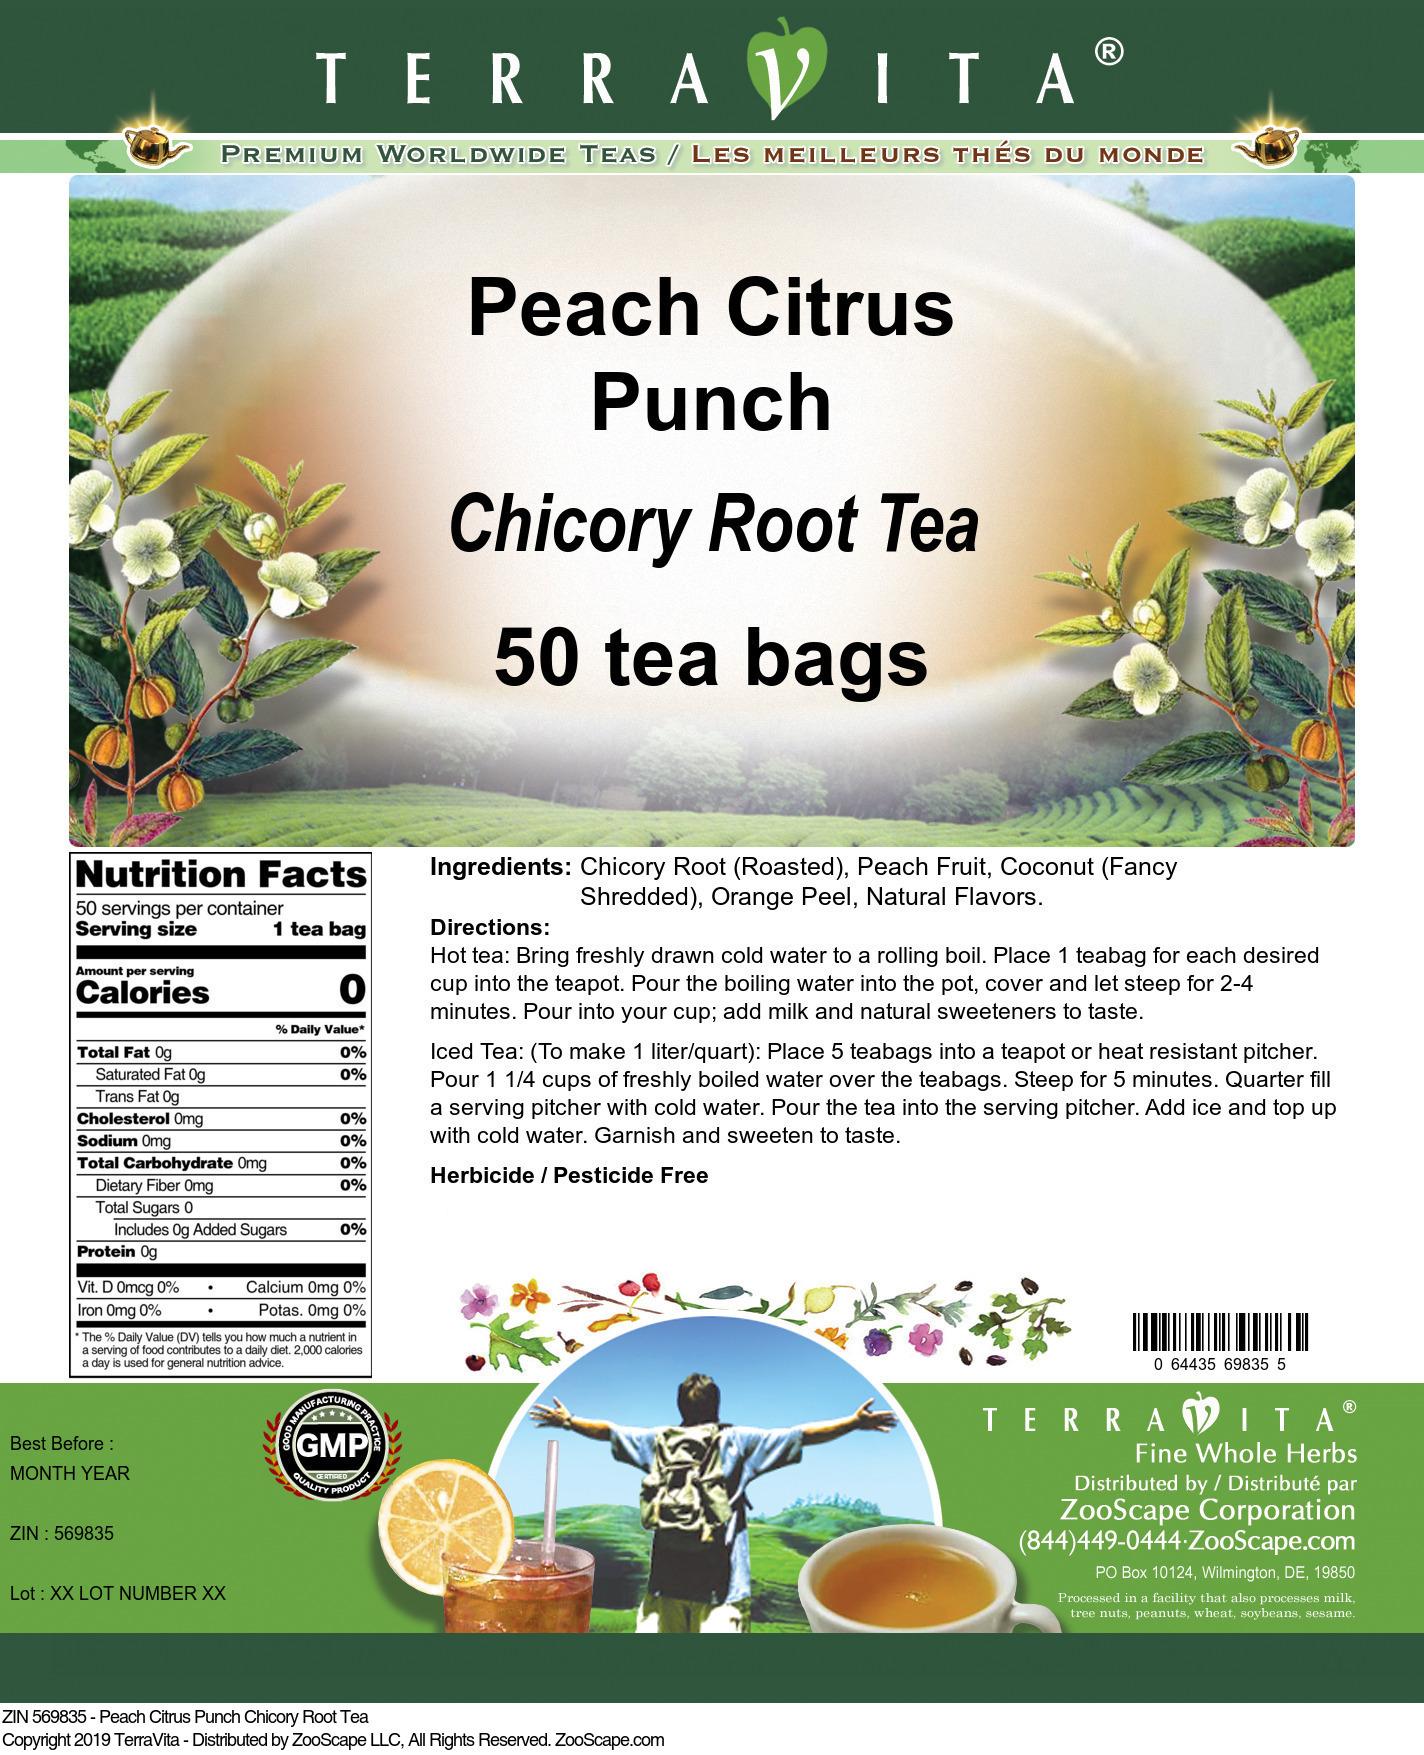 Peach Citrus Punch Chicory Root Tea